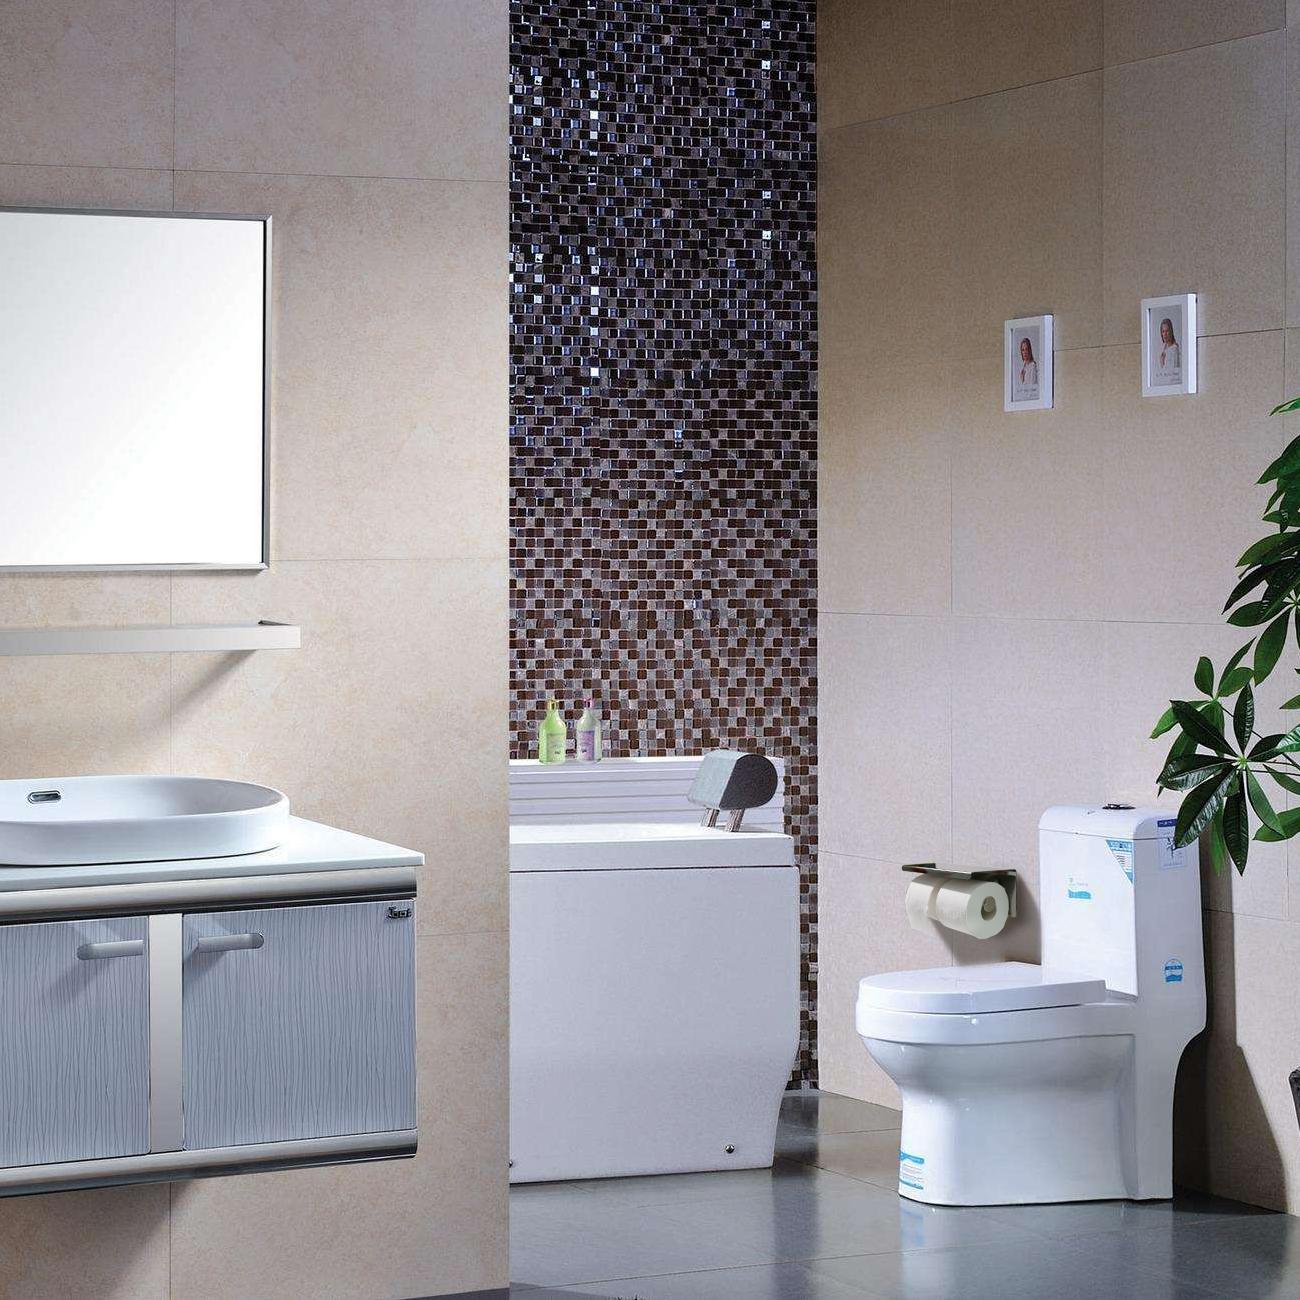 einfagood doppel edelstahl toilettenpapierhalter ohne bohrung edelstahl papierhalter mit. Black Bedroom Furniture Sets. Home Design Ideas